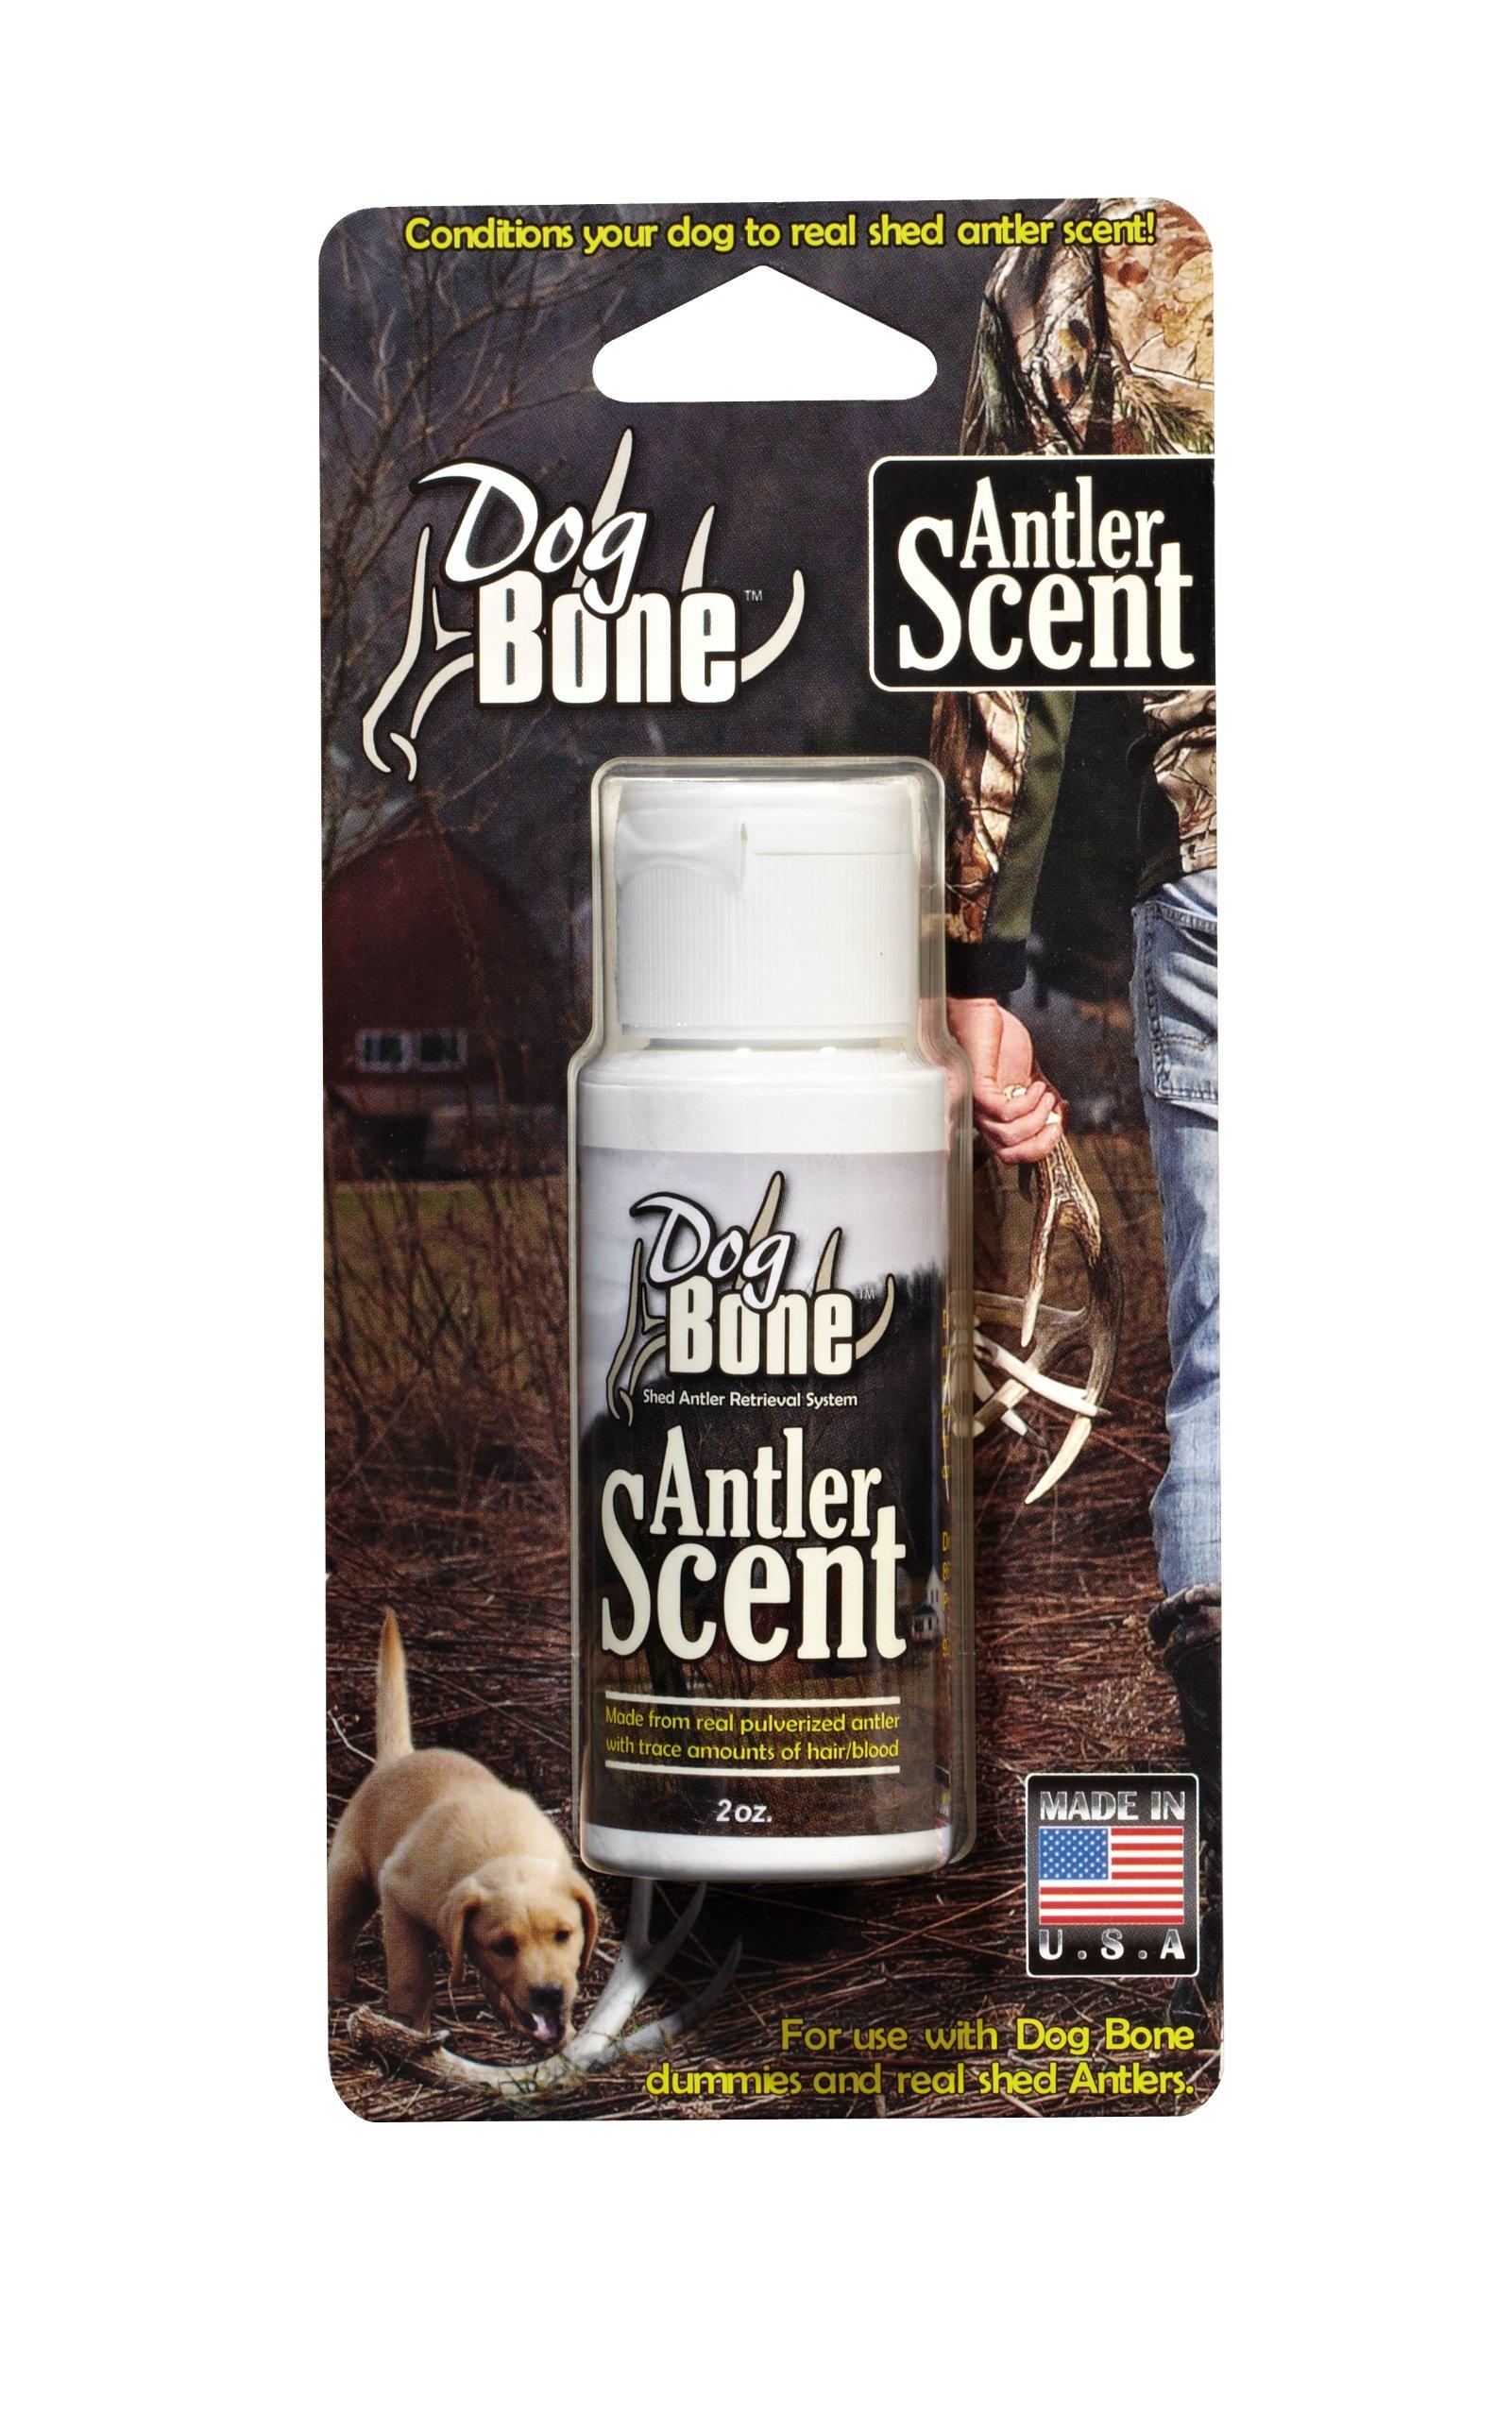 DogBone Genuine Antler Scent (2 oz.) Dog Training